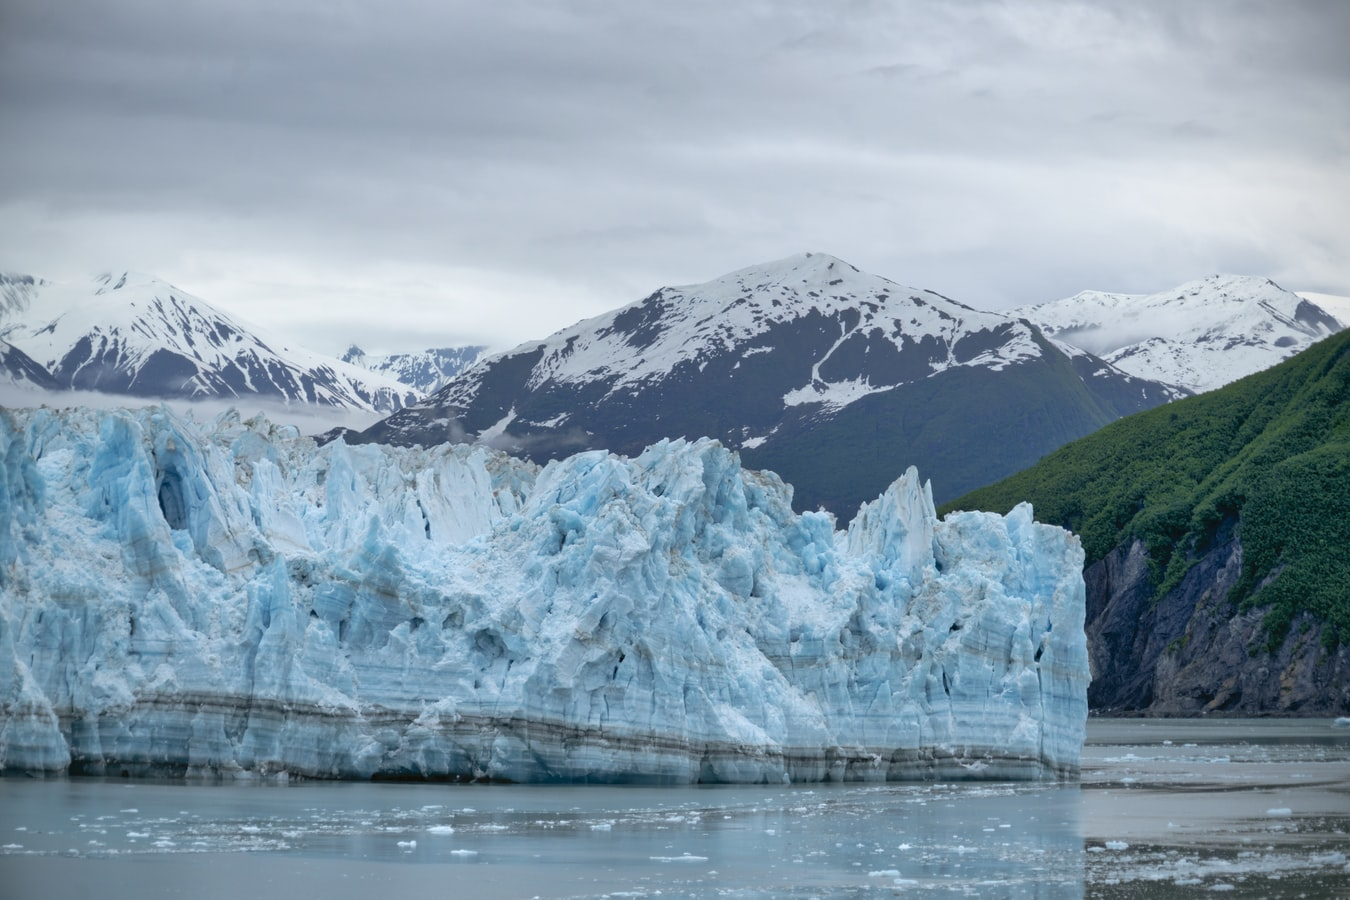 Verenigde-staten-alaska-hubbard-glacier-gletsjer-bergen-zee